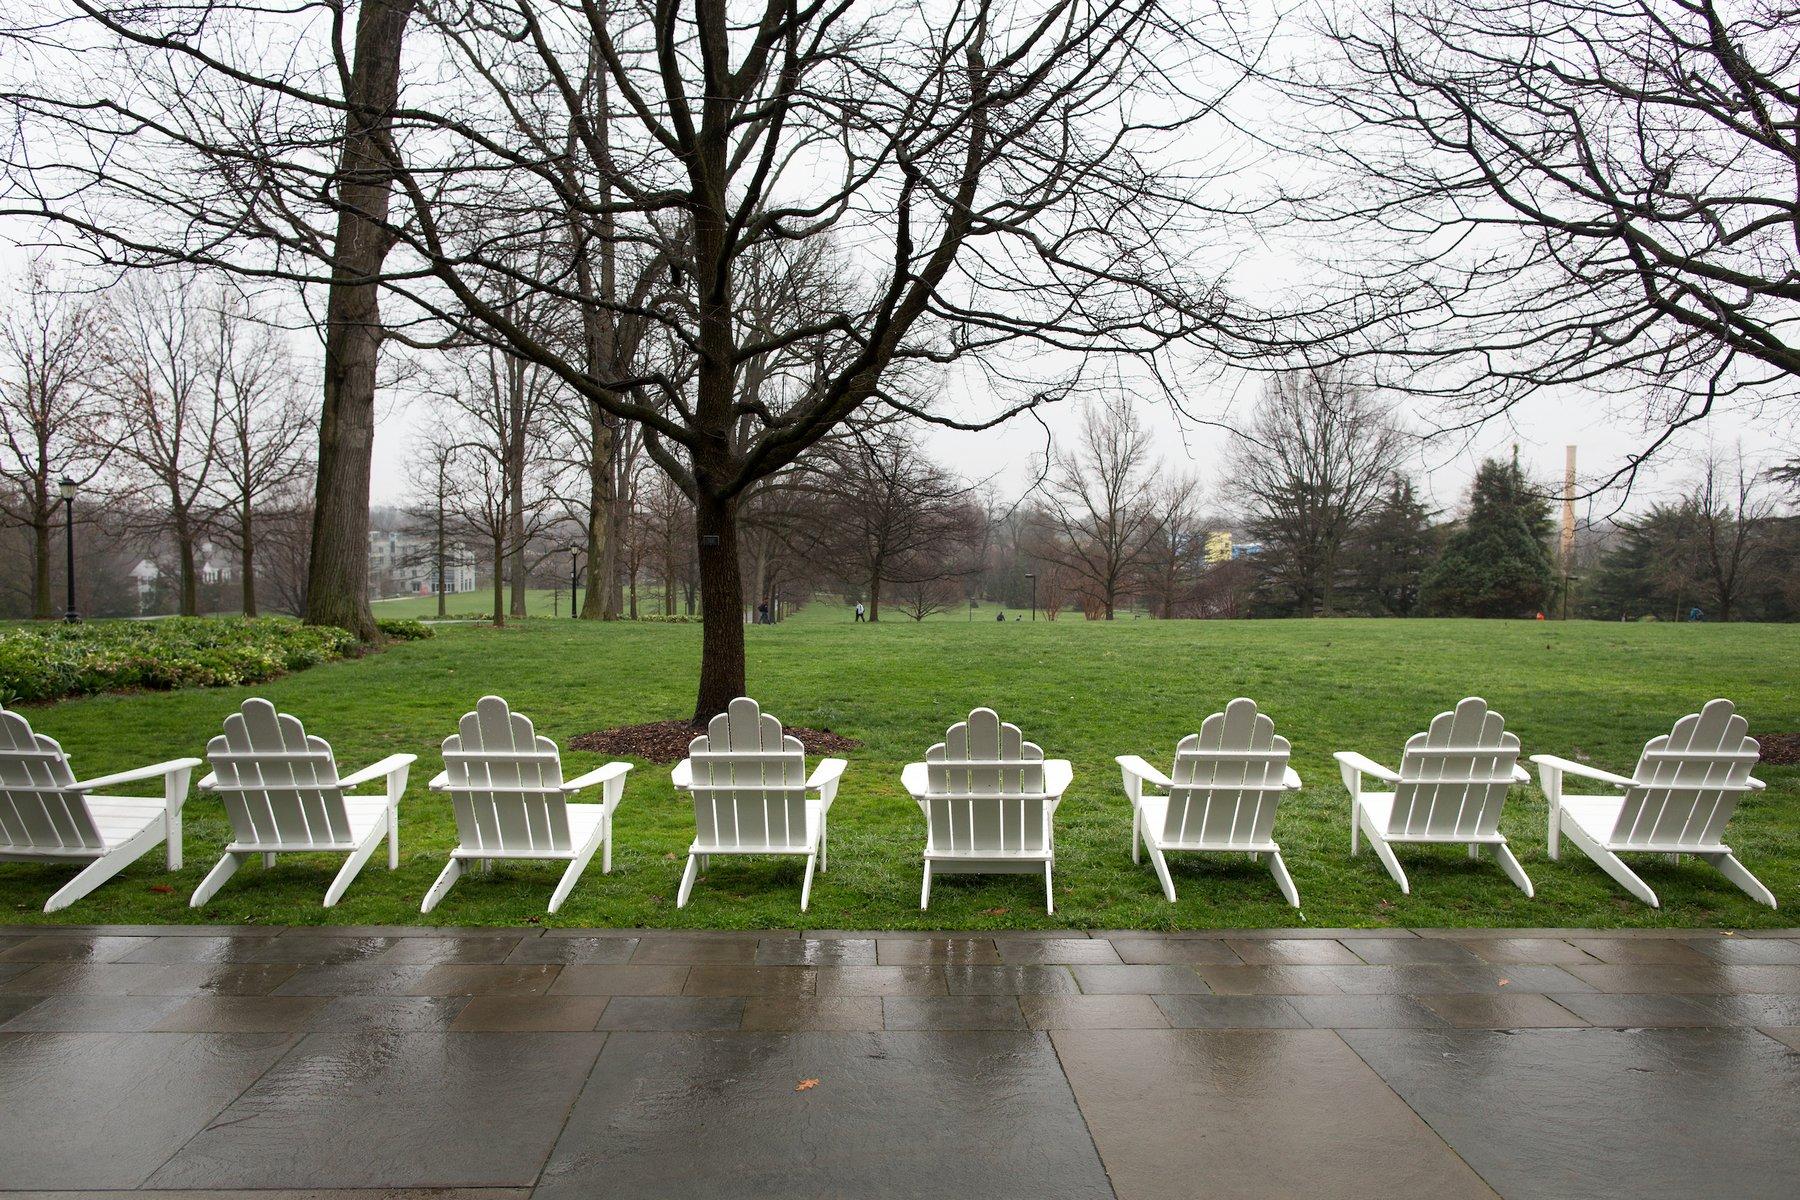 A row of empty Adirondack chairs on Parrish Beeach